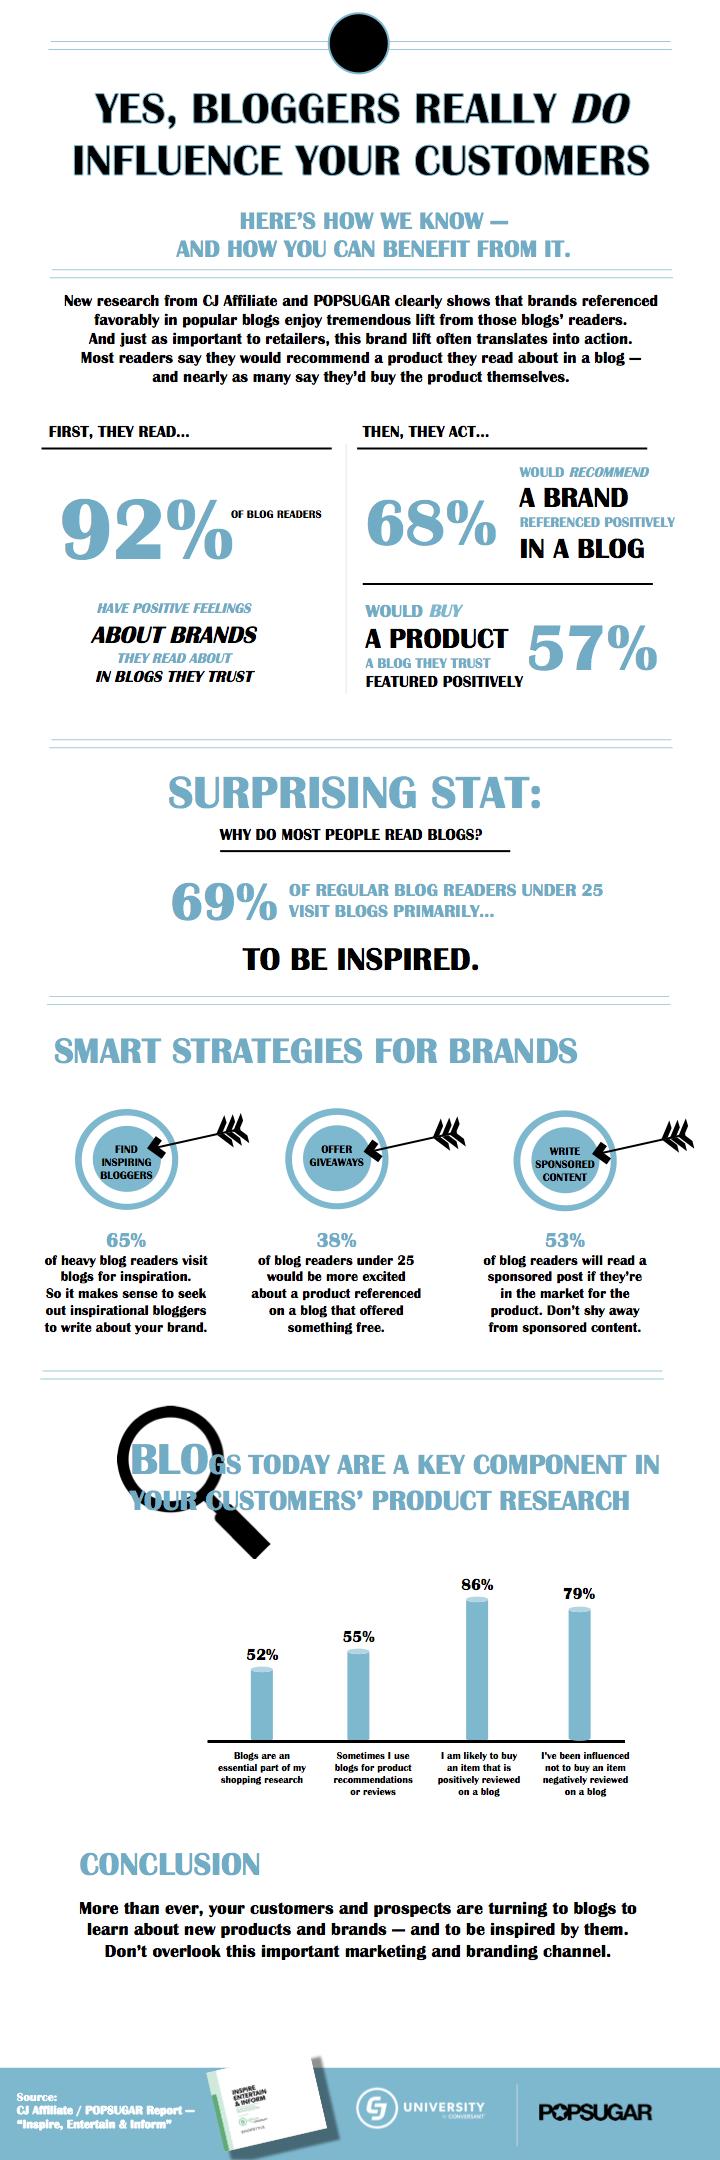 CJU Webinar Oct 2015 -- Blogger Influence -- Infographic-100115